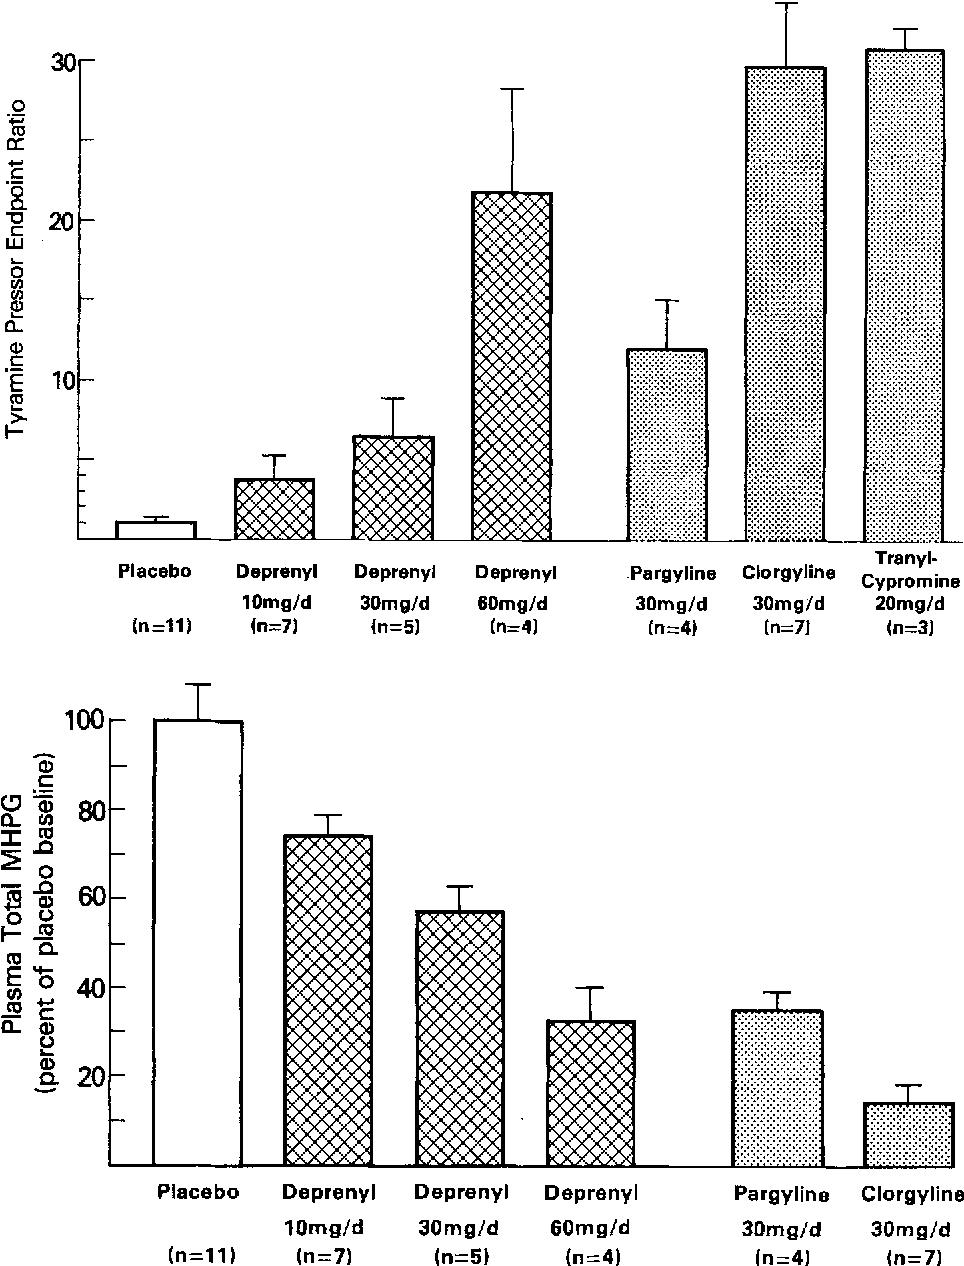 Tyramine pressor sensitivity changes during deprenyl